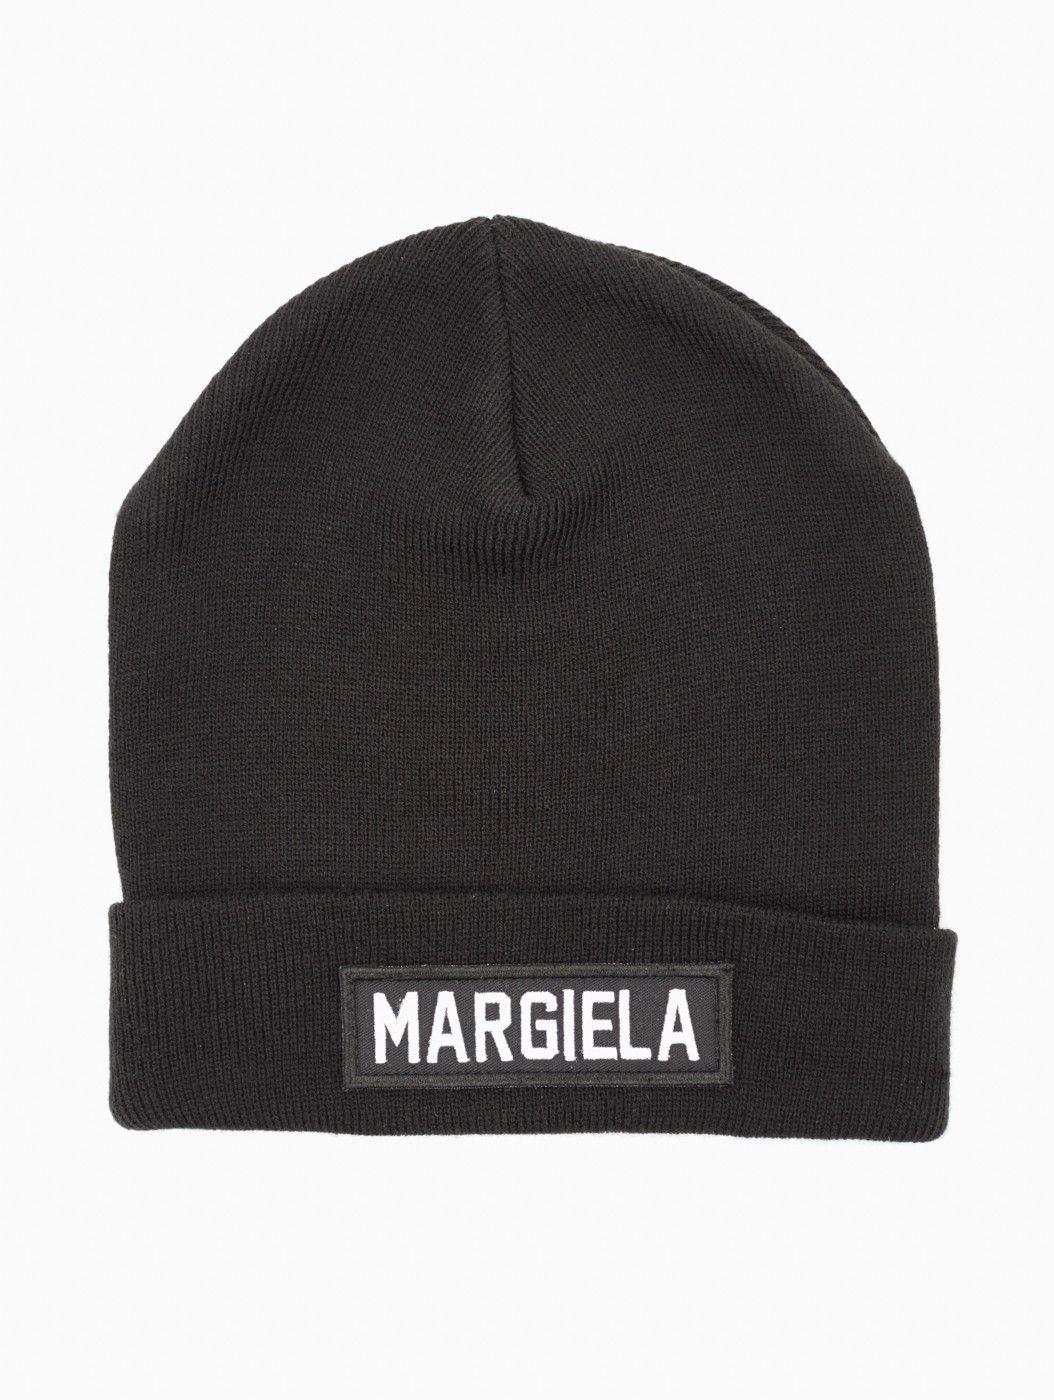 """Margiela"" beanie"